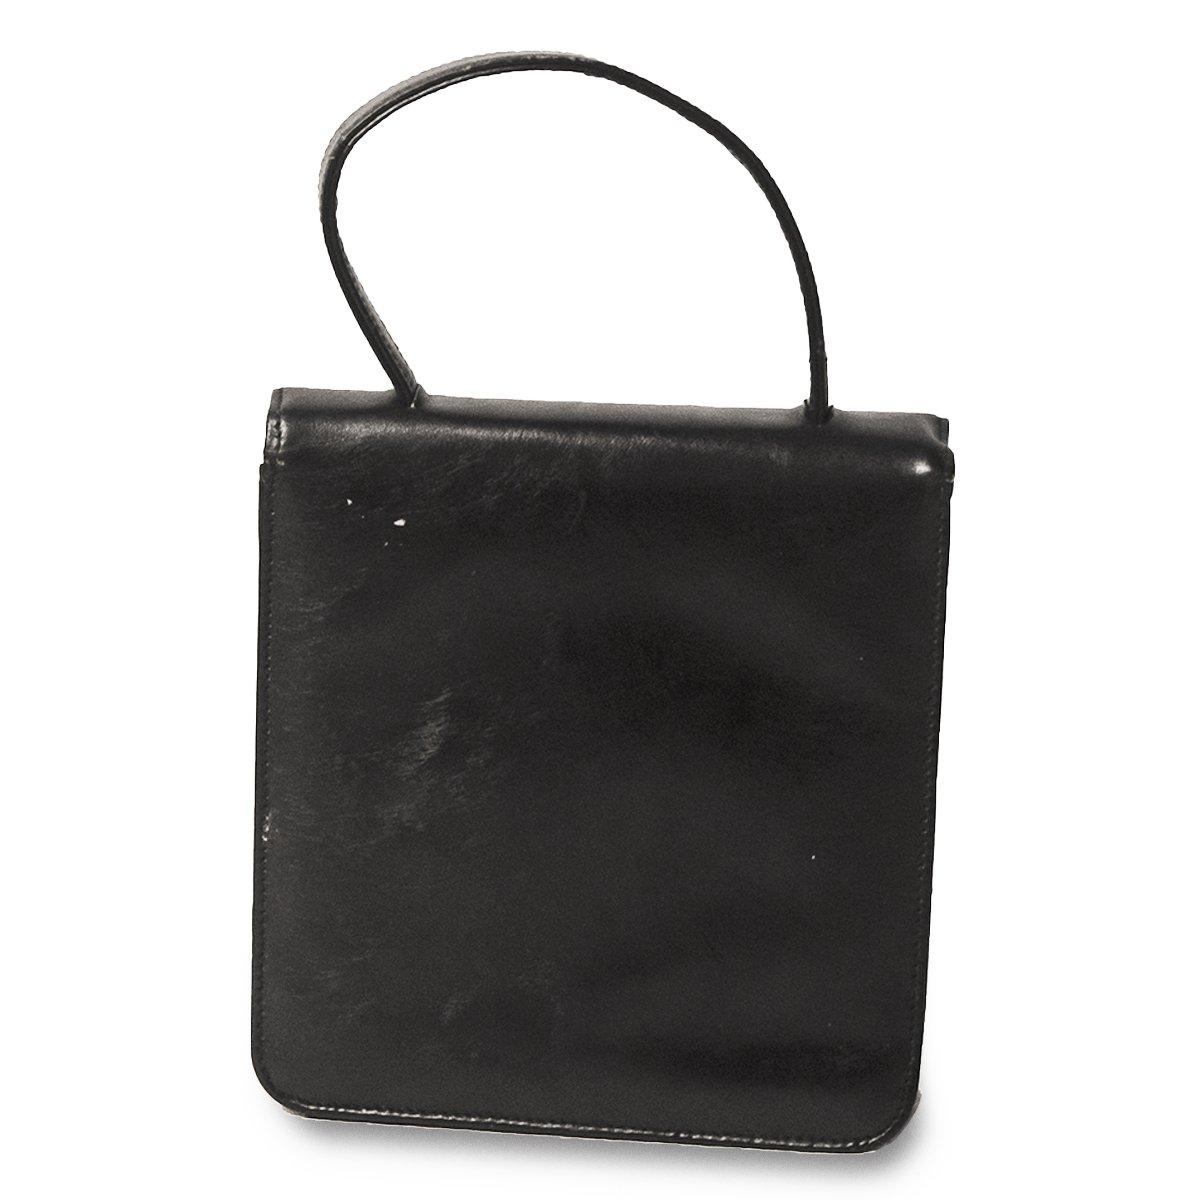 1950s Black Cocktail Bag, Rhinestone Closure